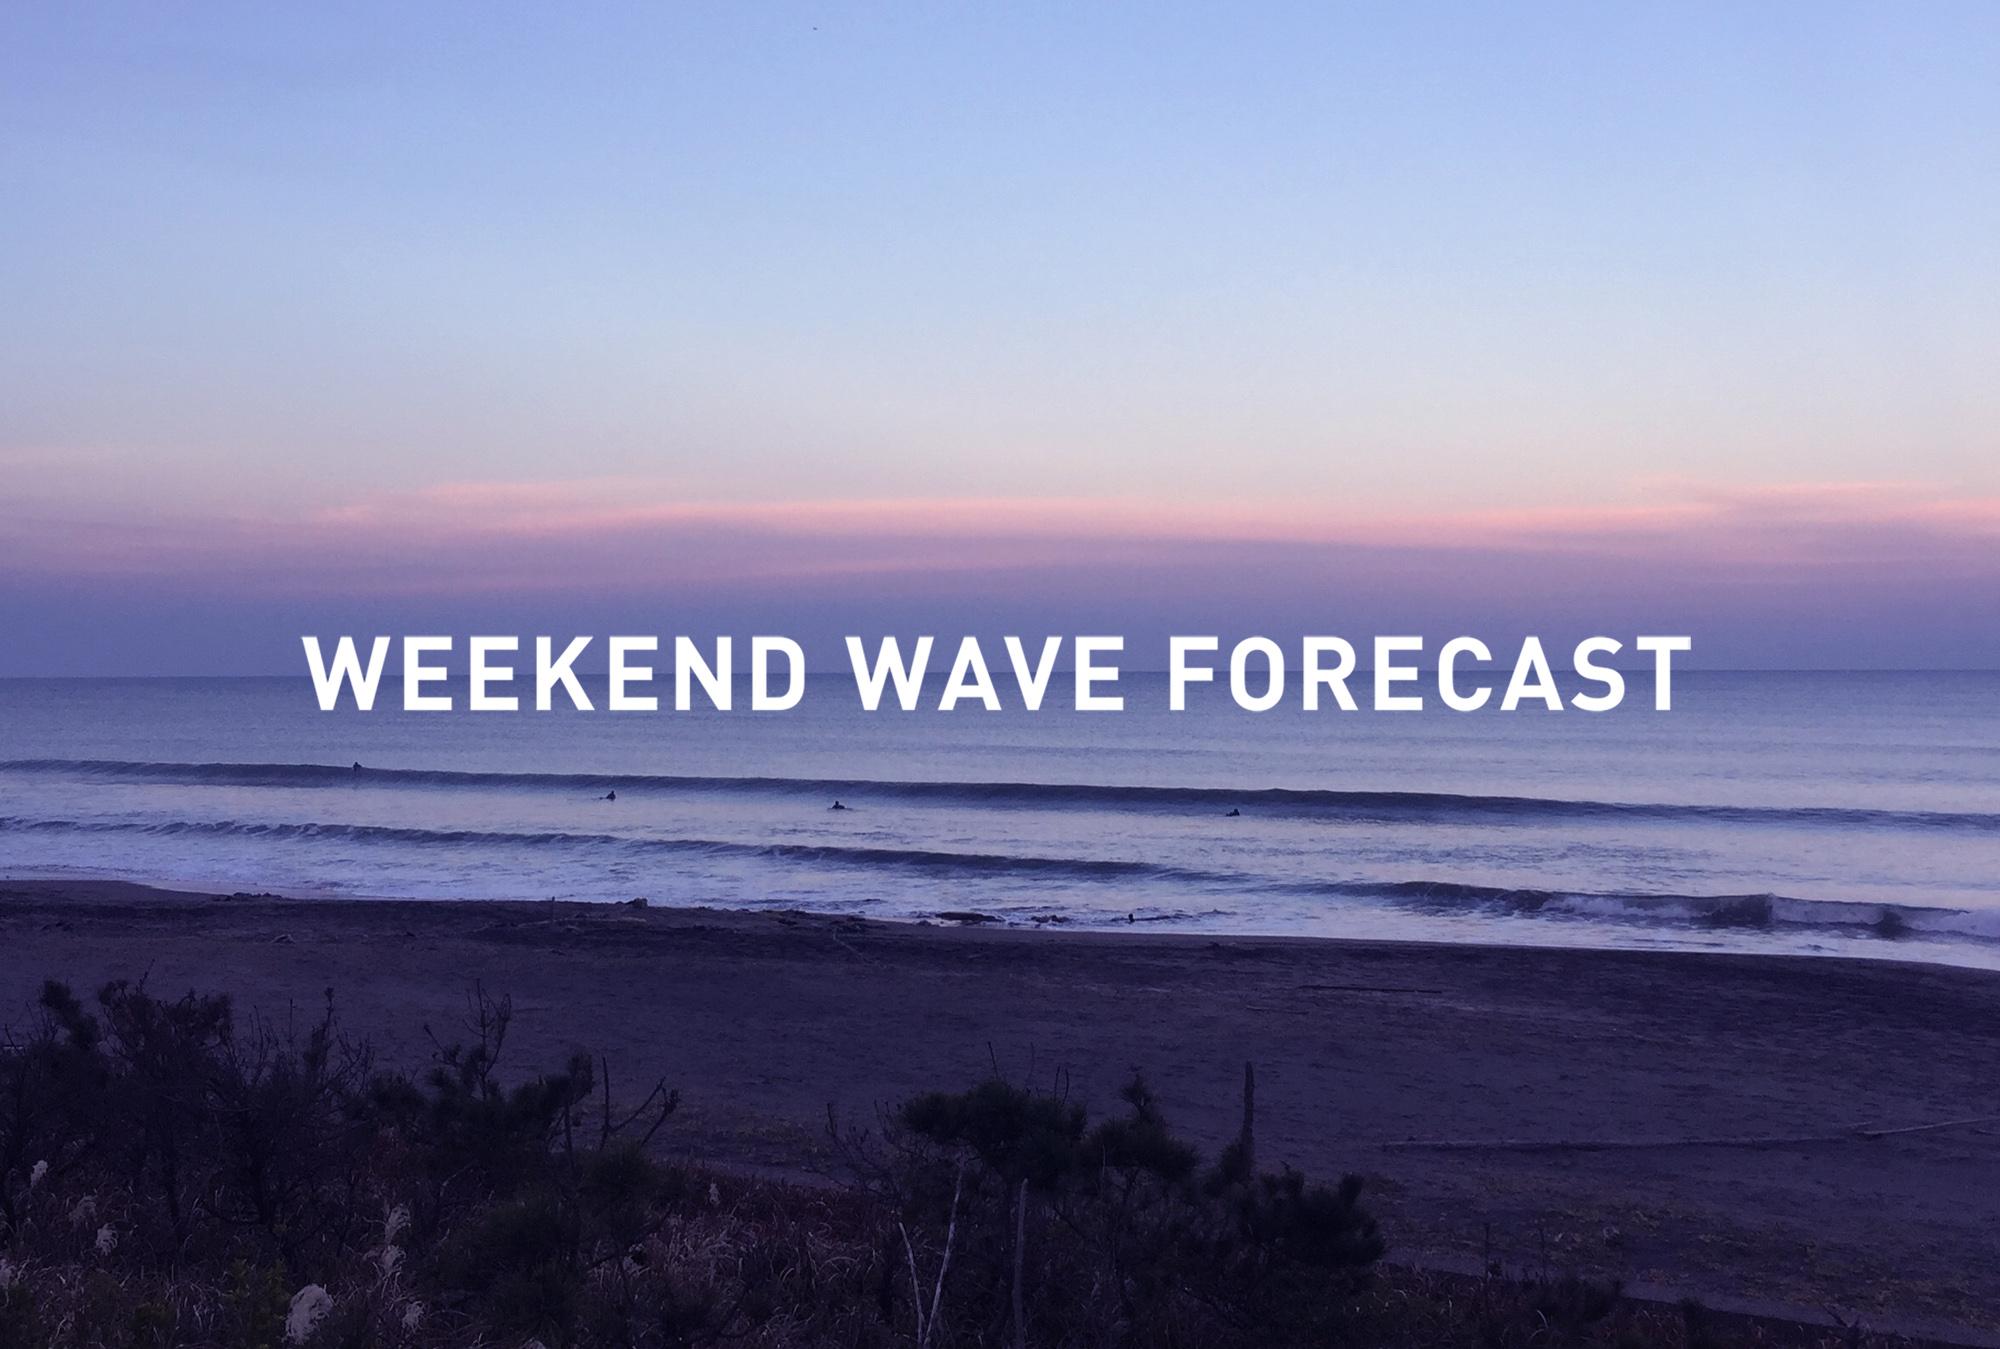 weekend wave forecast 0928